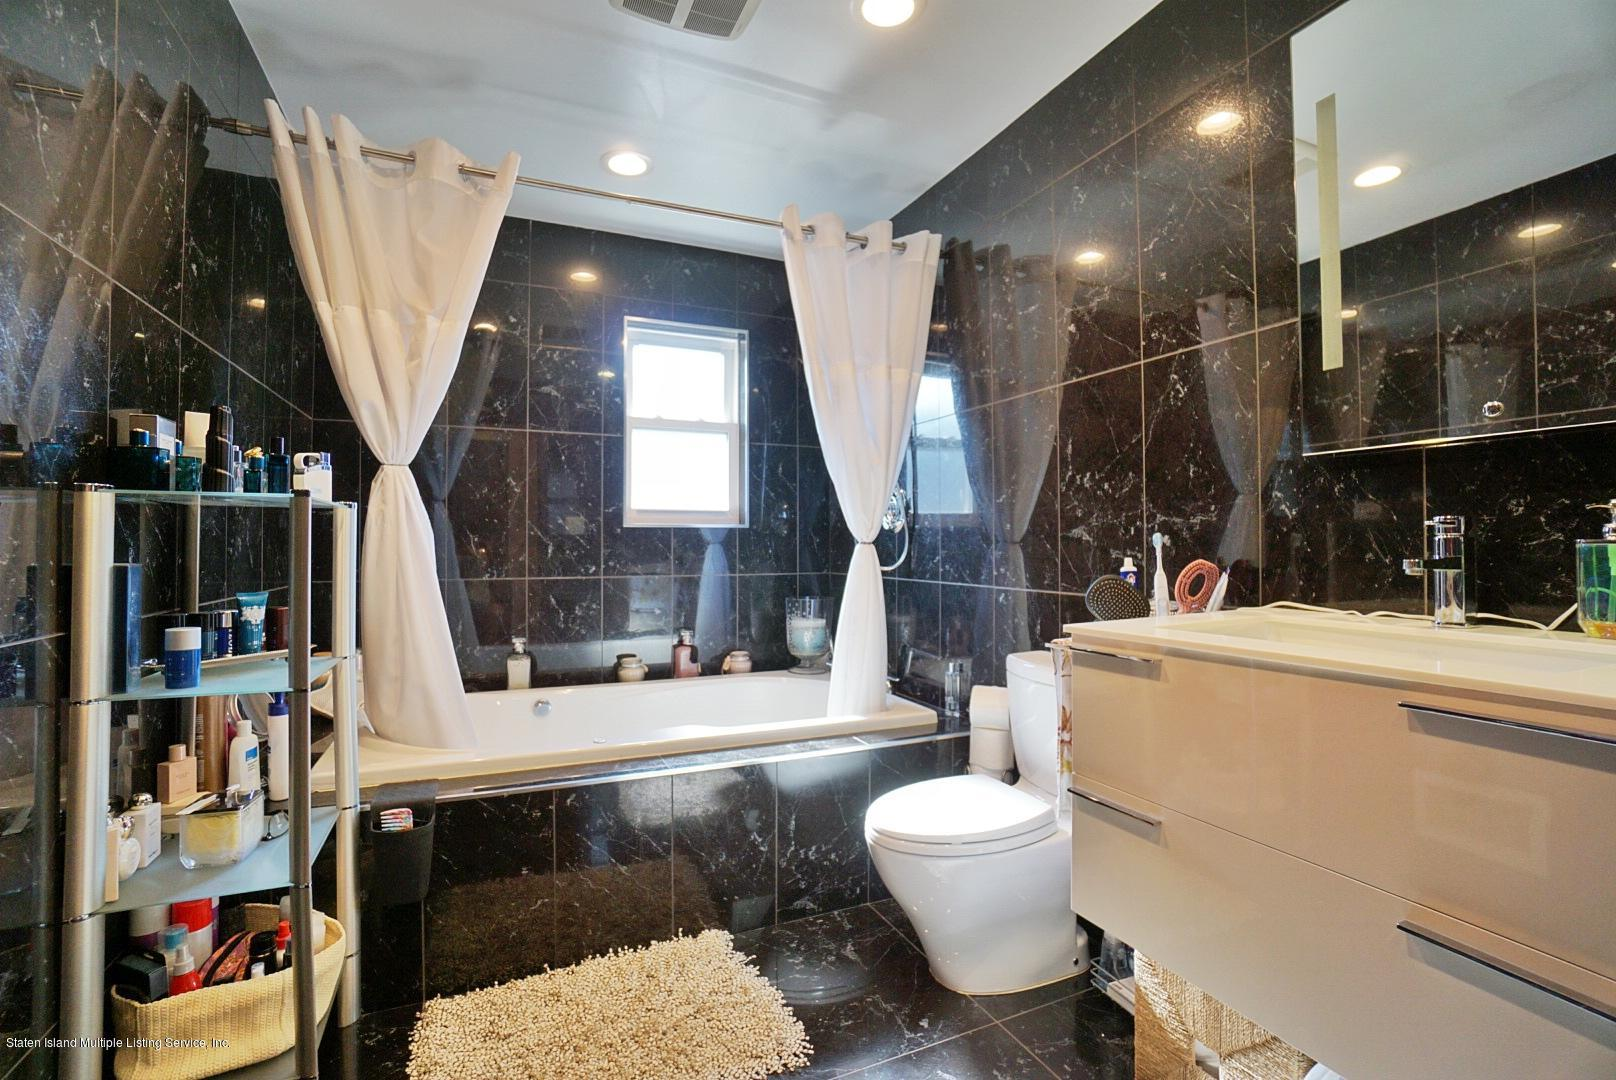 Single Family - Detached 48 Ocean Terrace  Staten Island, NY 10314, MLS-1130826-51